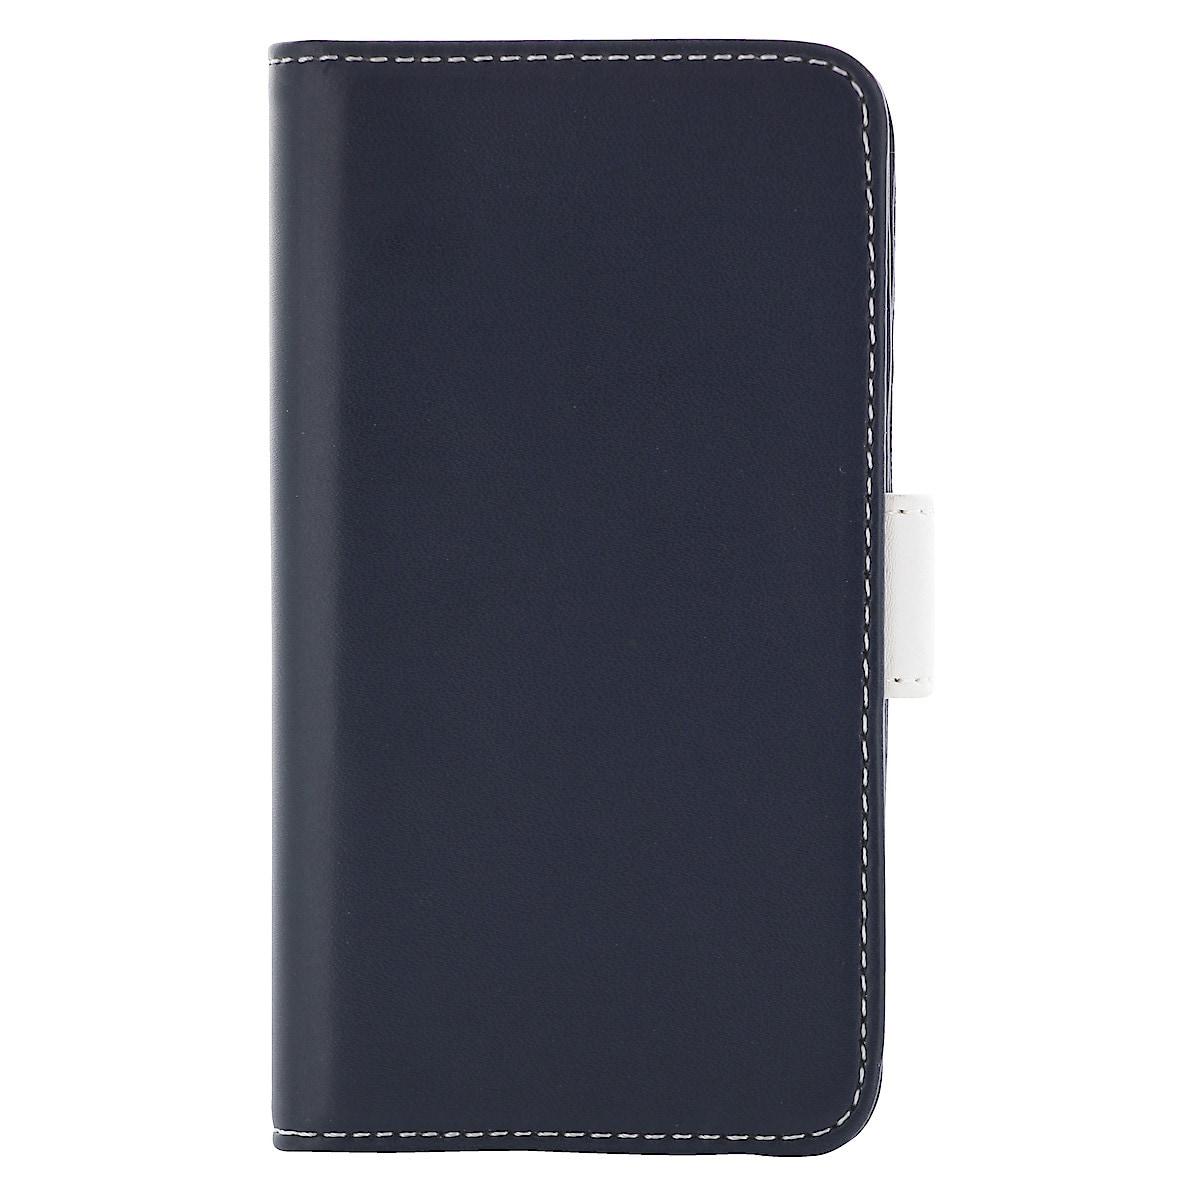 Plånboksfodral för iPhone 5 Holdit